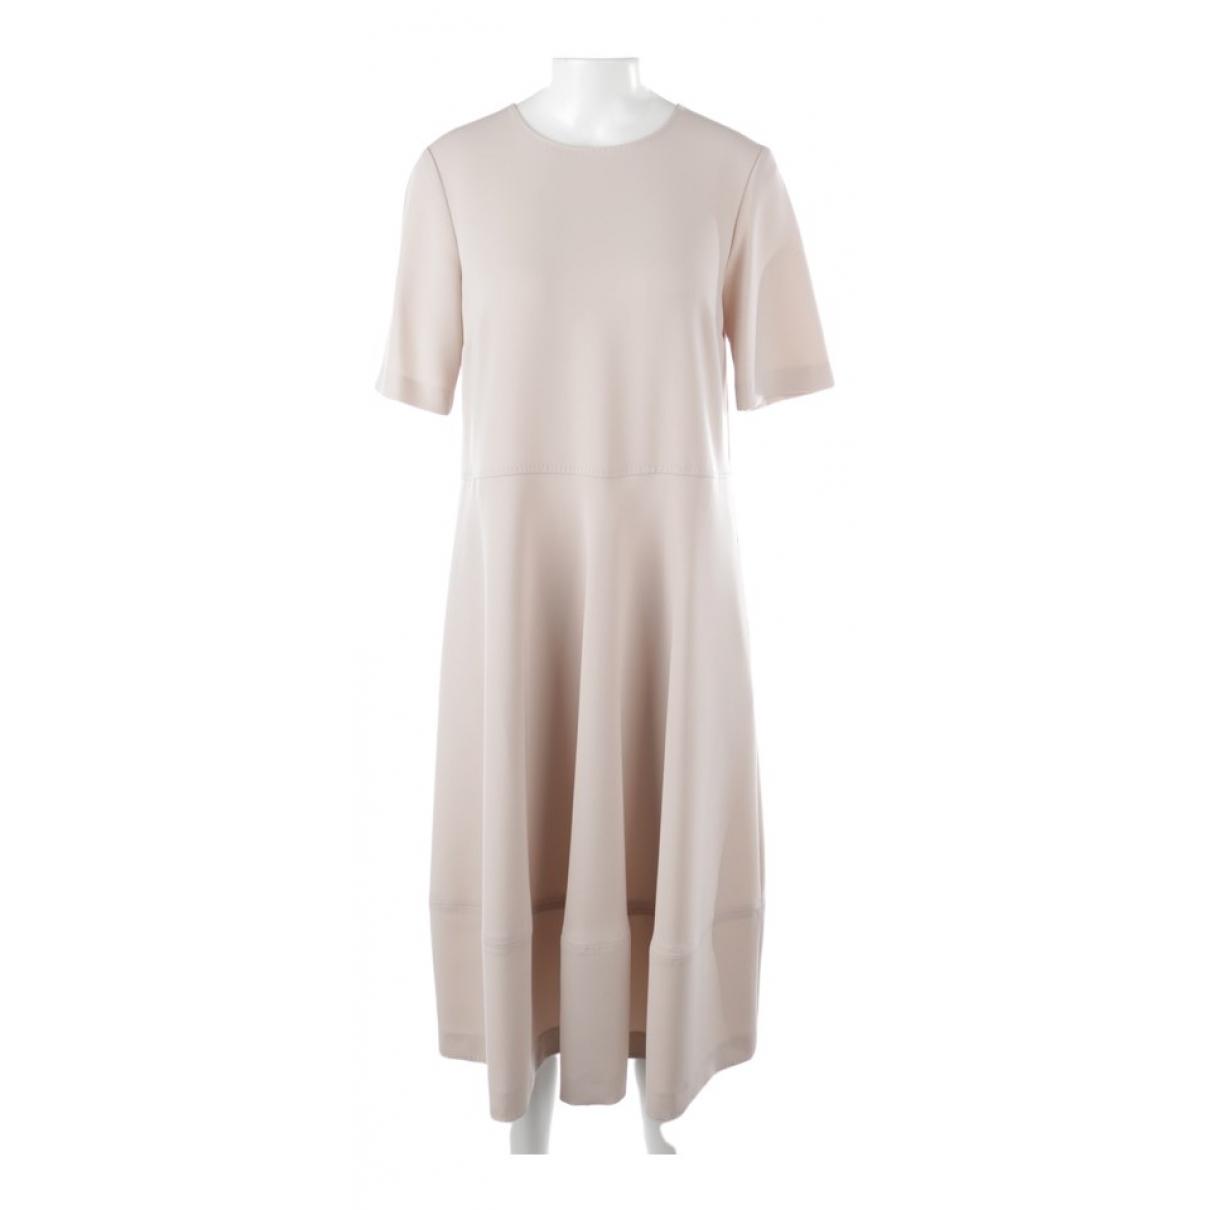 Max Mara \N Beige Cotton dress for Women 38 FR